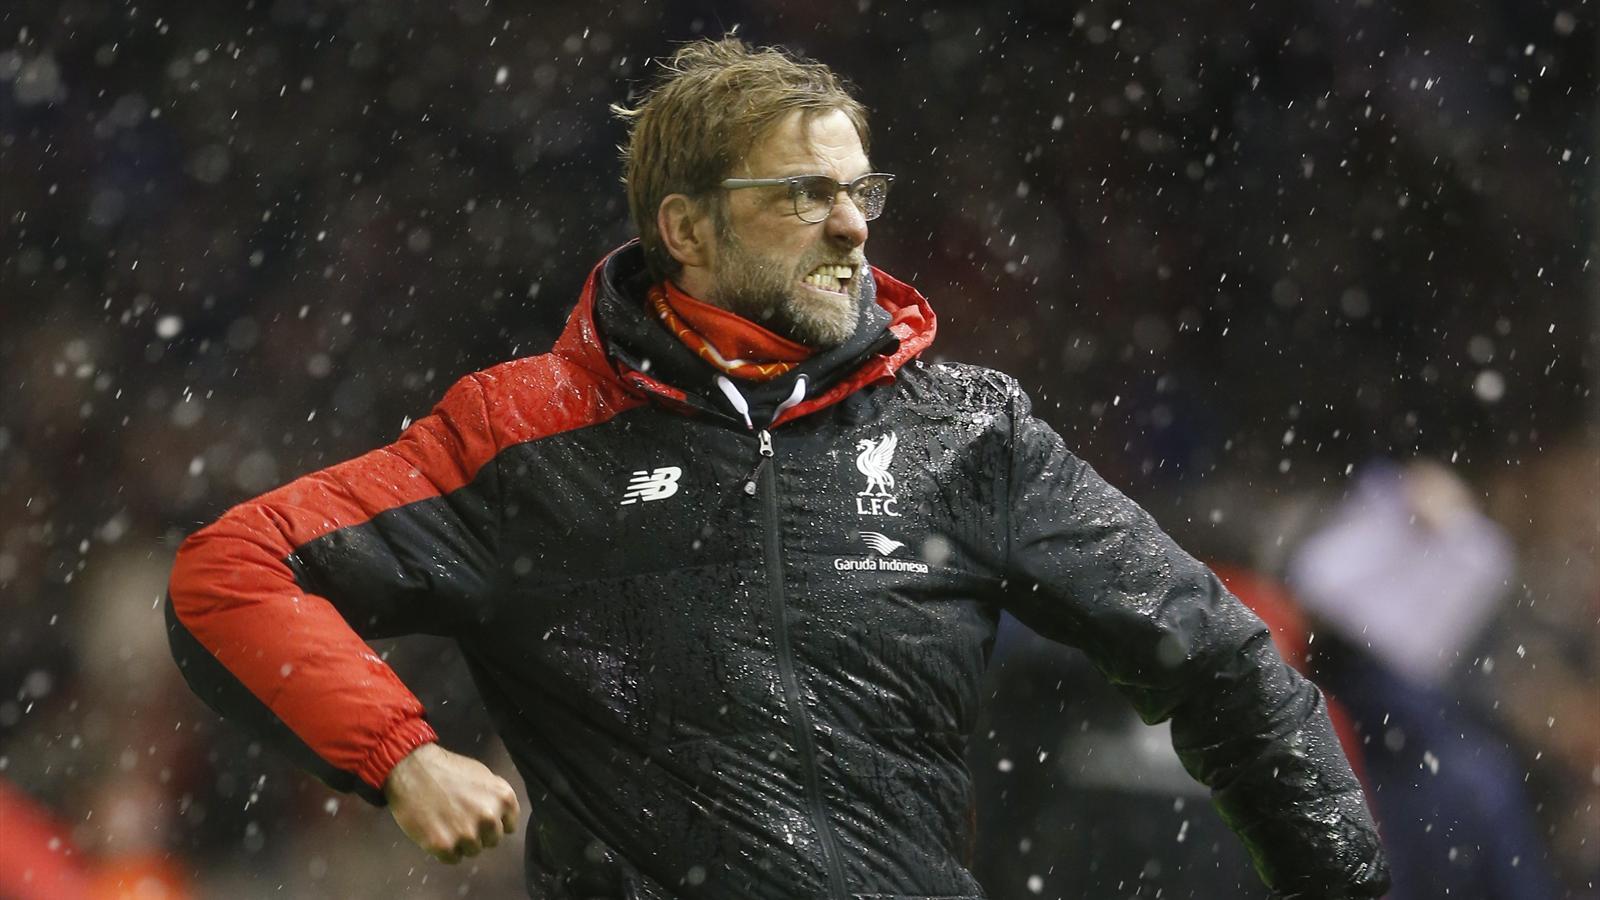 Jurgen Klopp celebrates Liverpool grabbing a point against Arsenal